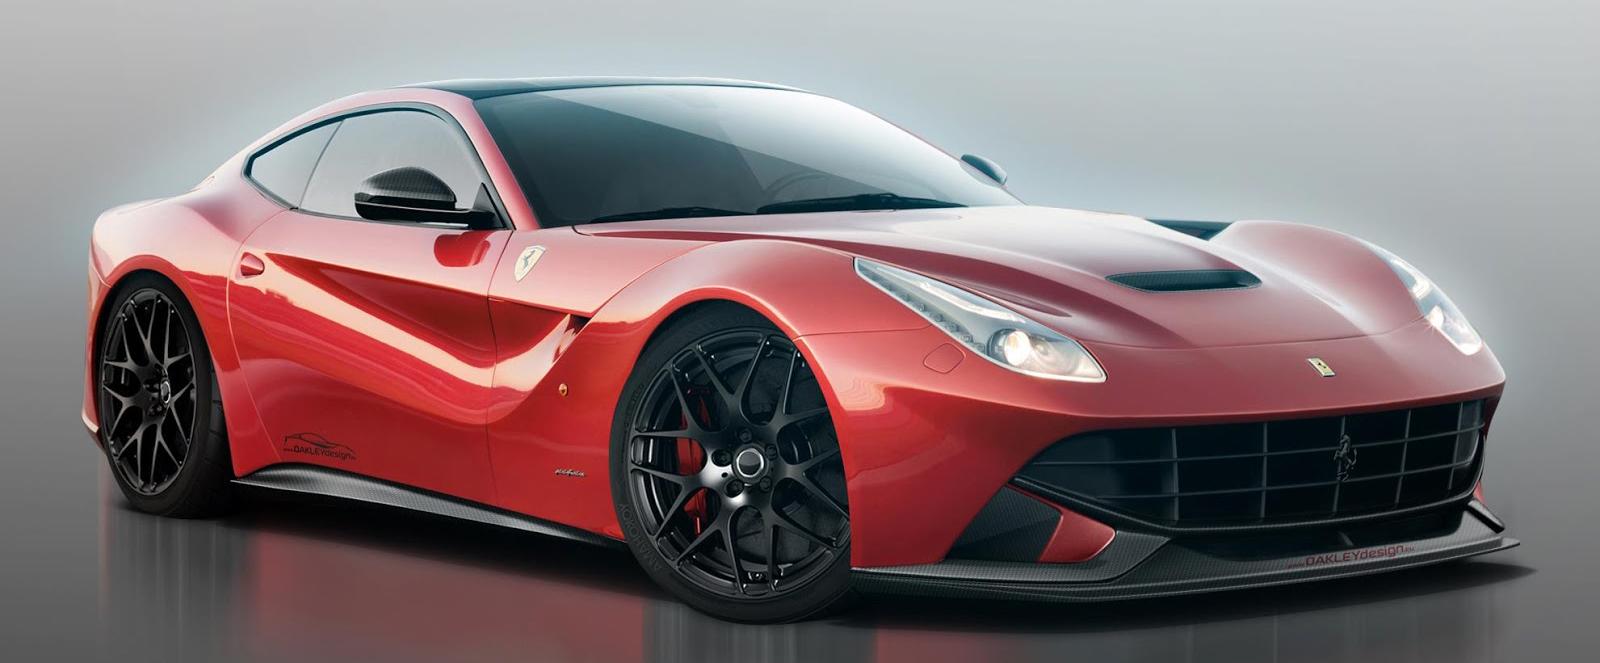 the rental car for price cabrio ville en ferrari red cost in rent monaco t california